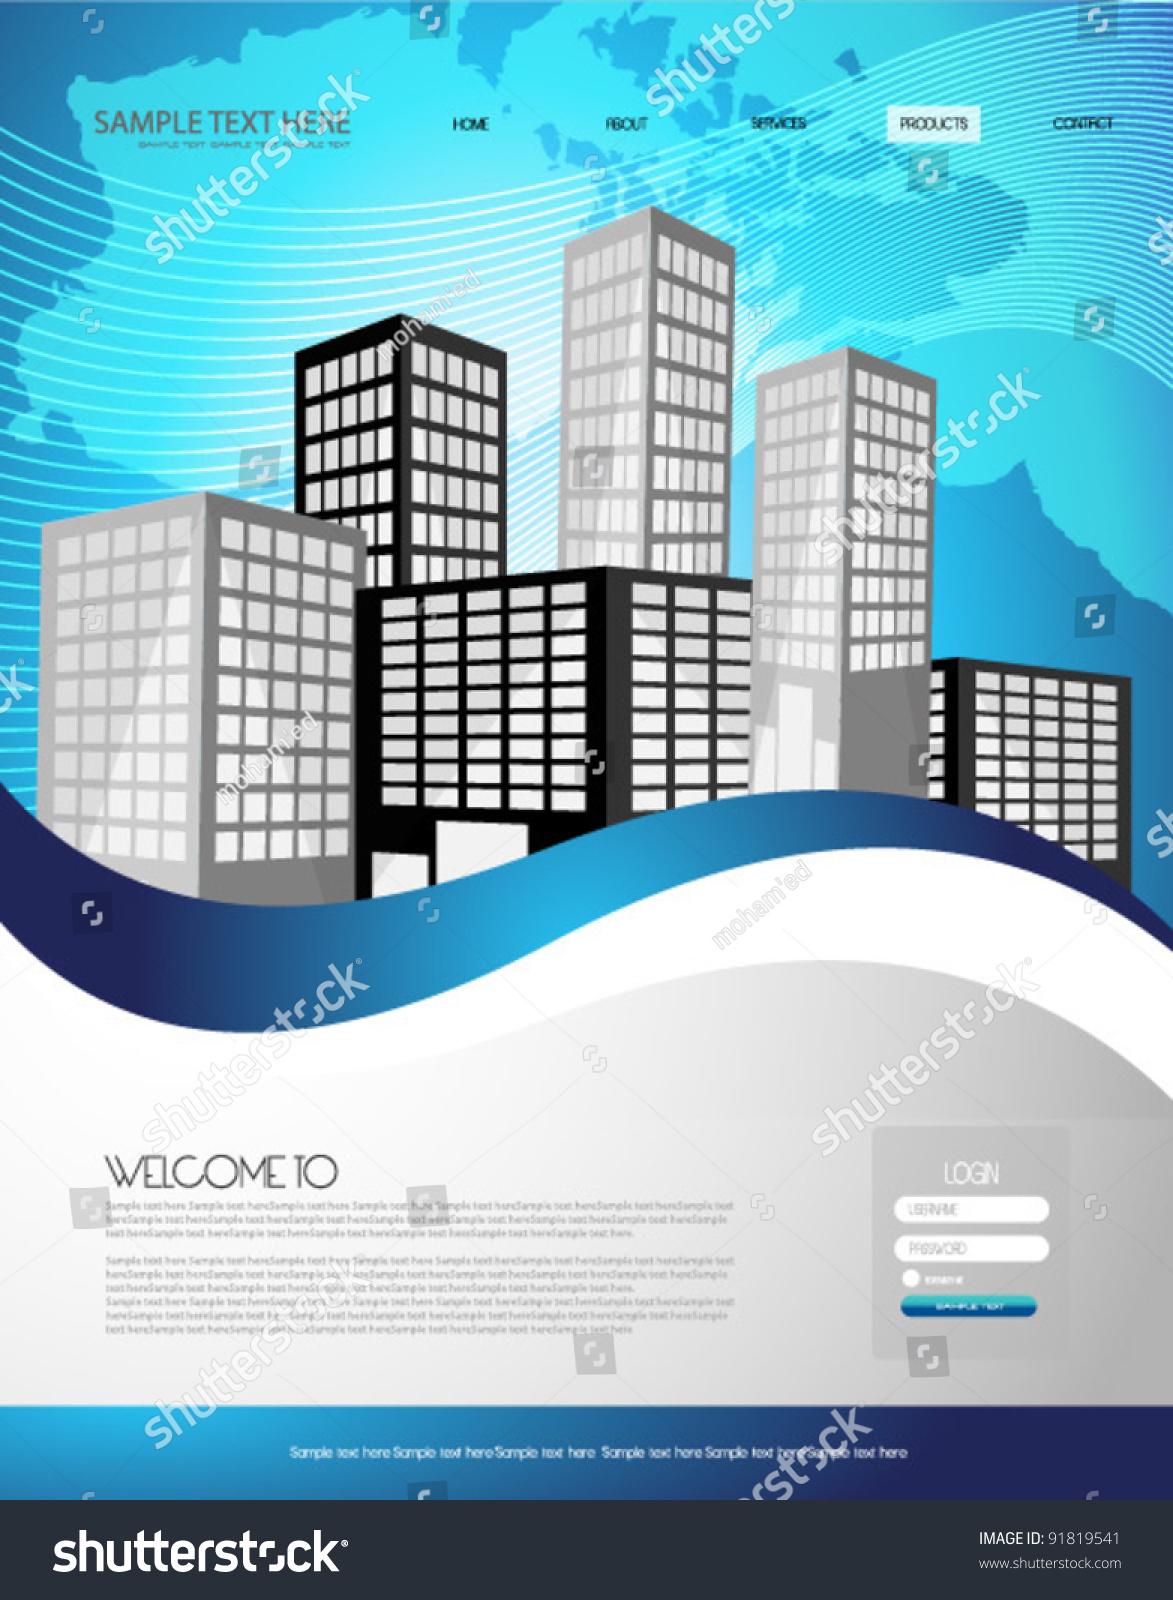 Real estate billboard design samples - Real Estate Web Template